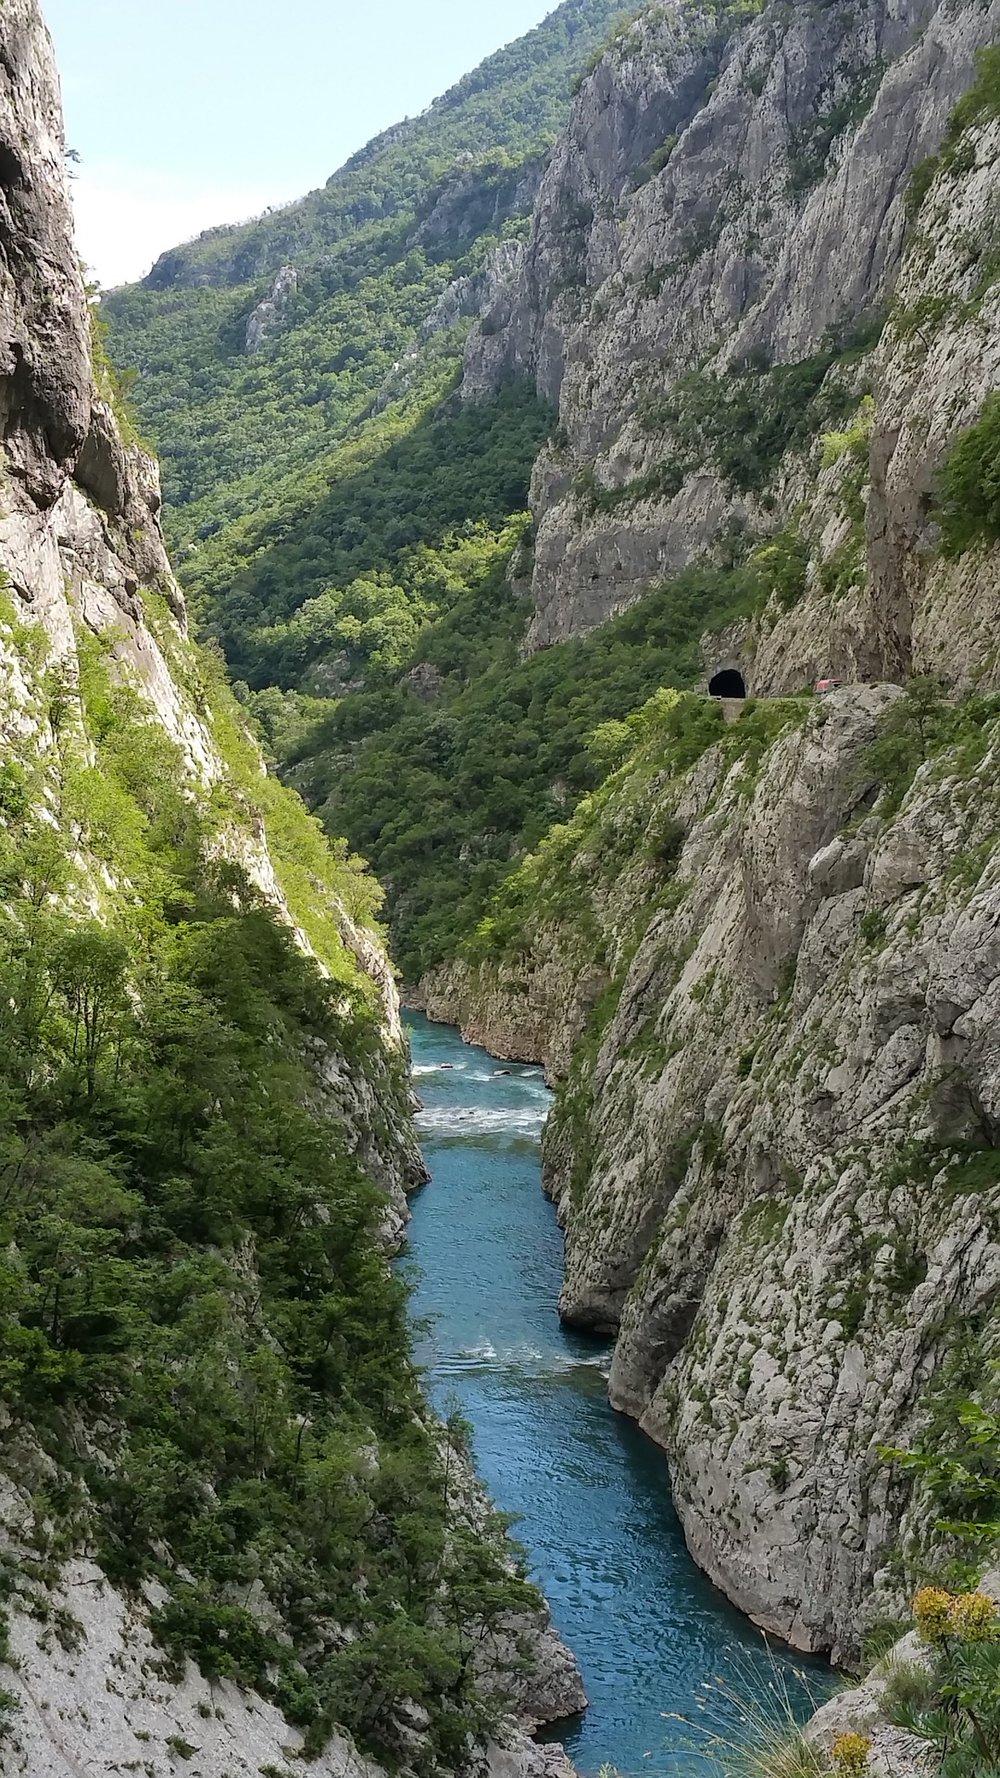 montenegro-3582524_1920.jpg